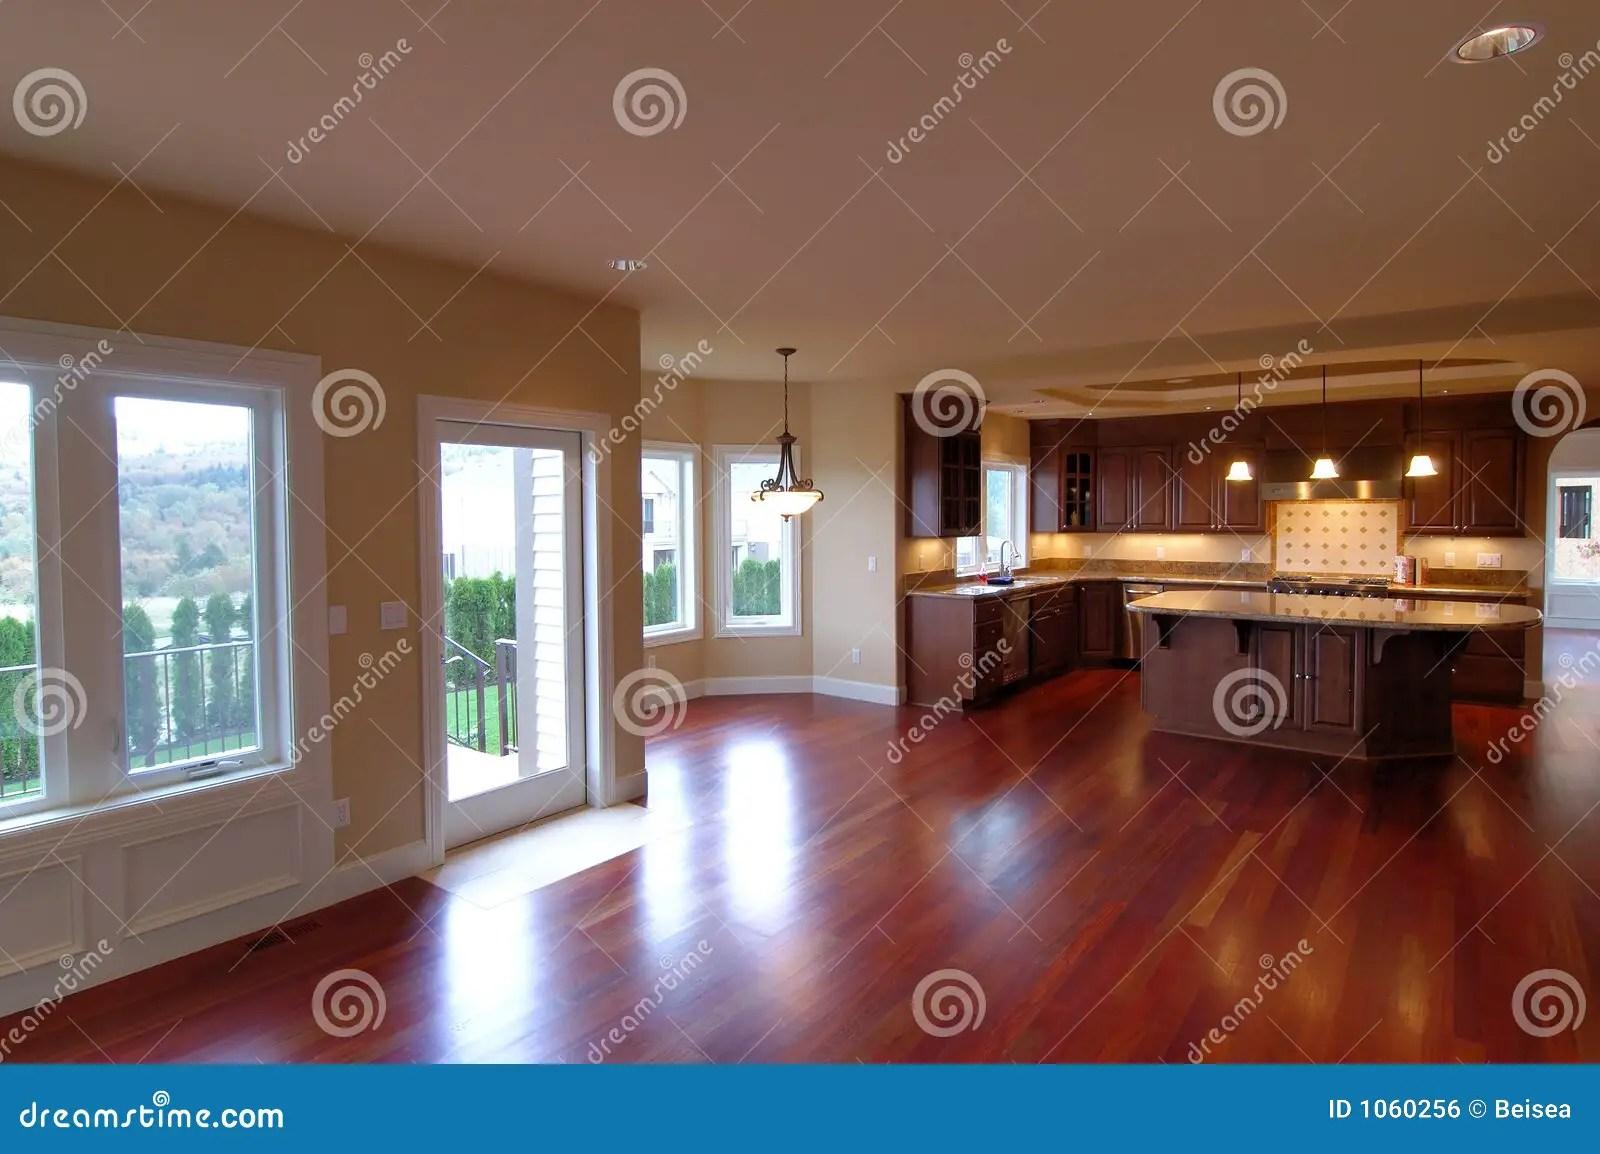 Luxury American House Interior No3 Royalty Free Stock